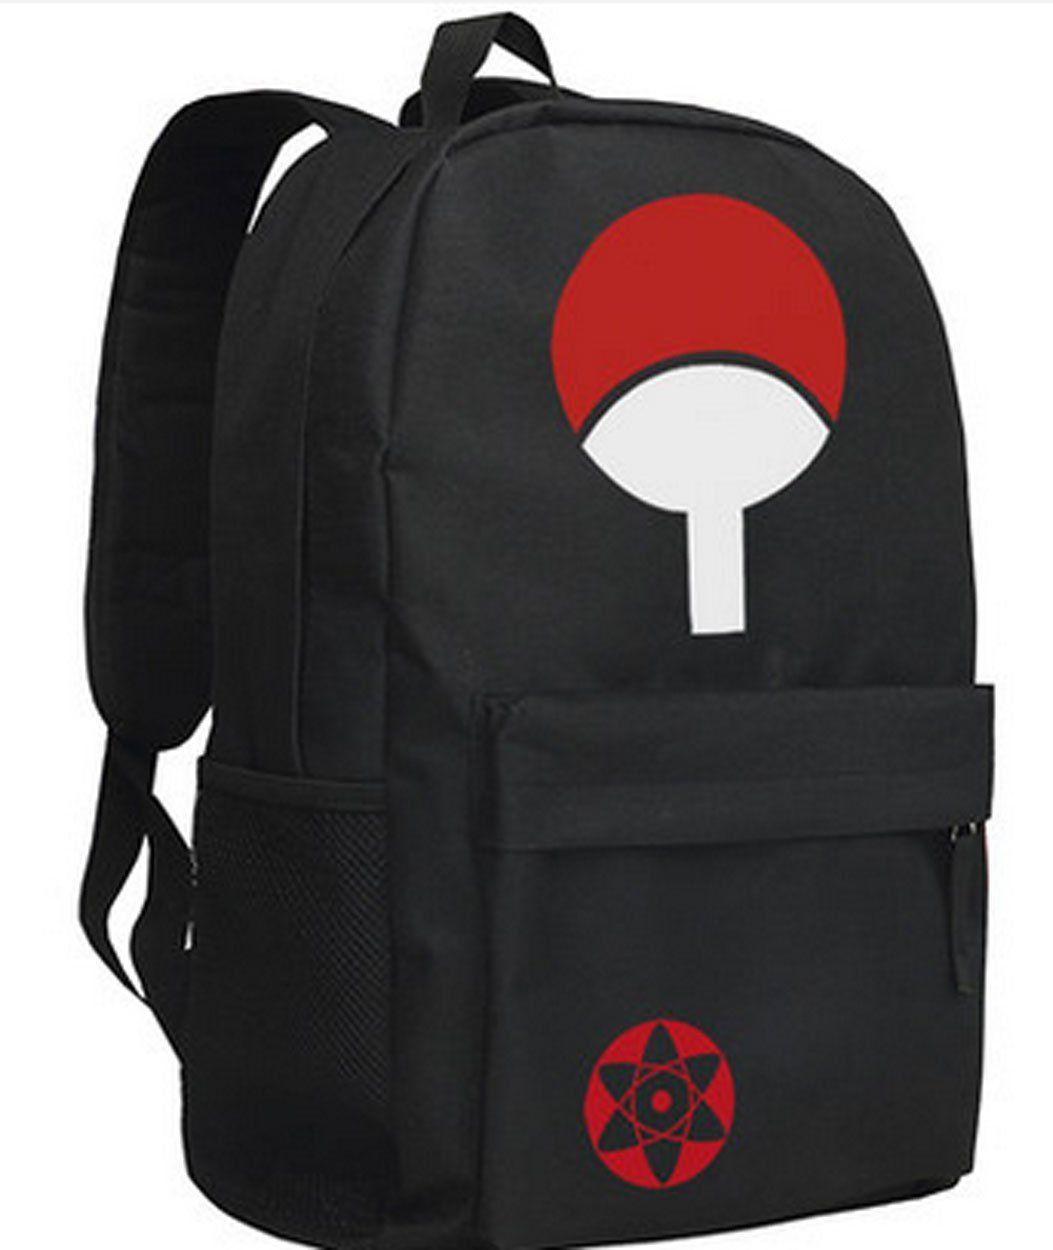 a9767cc97a36 Relaxcos Naruto Uchiha Logo Bag School Bag Cosplay Costume >>> Find ...